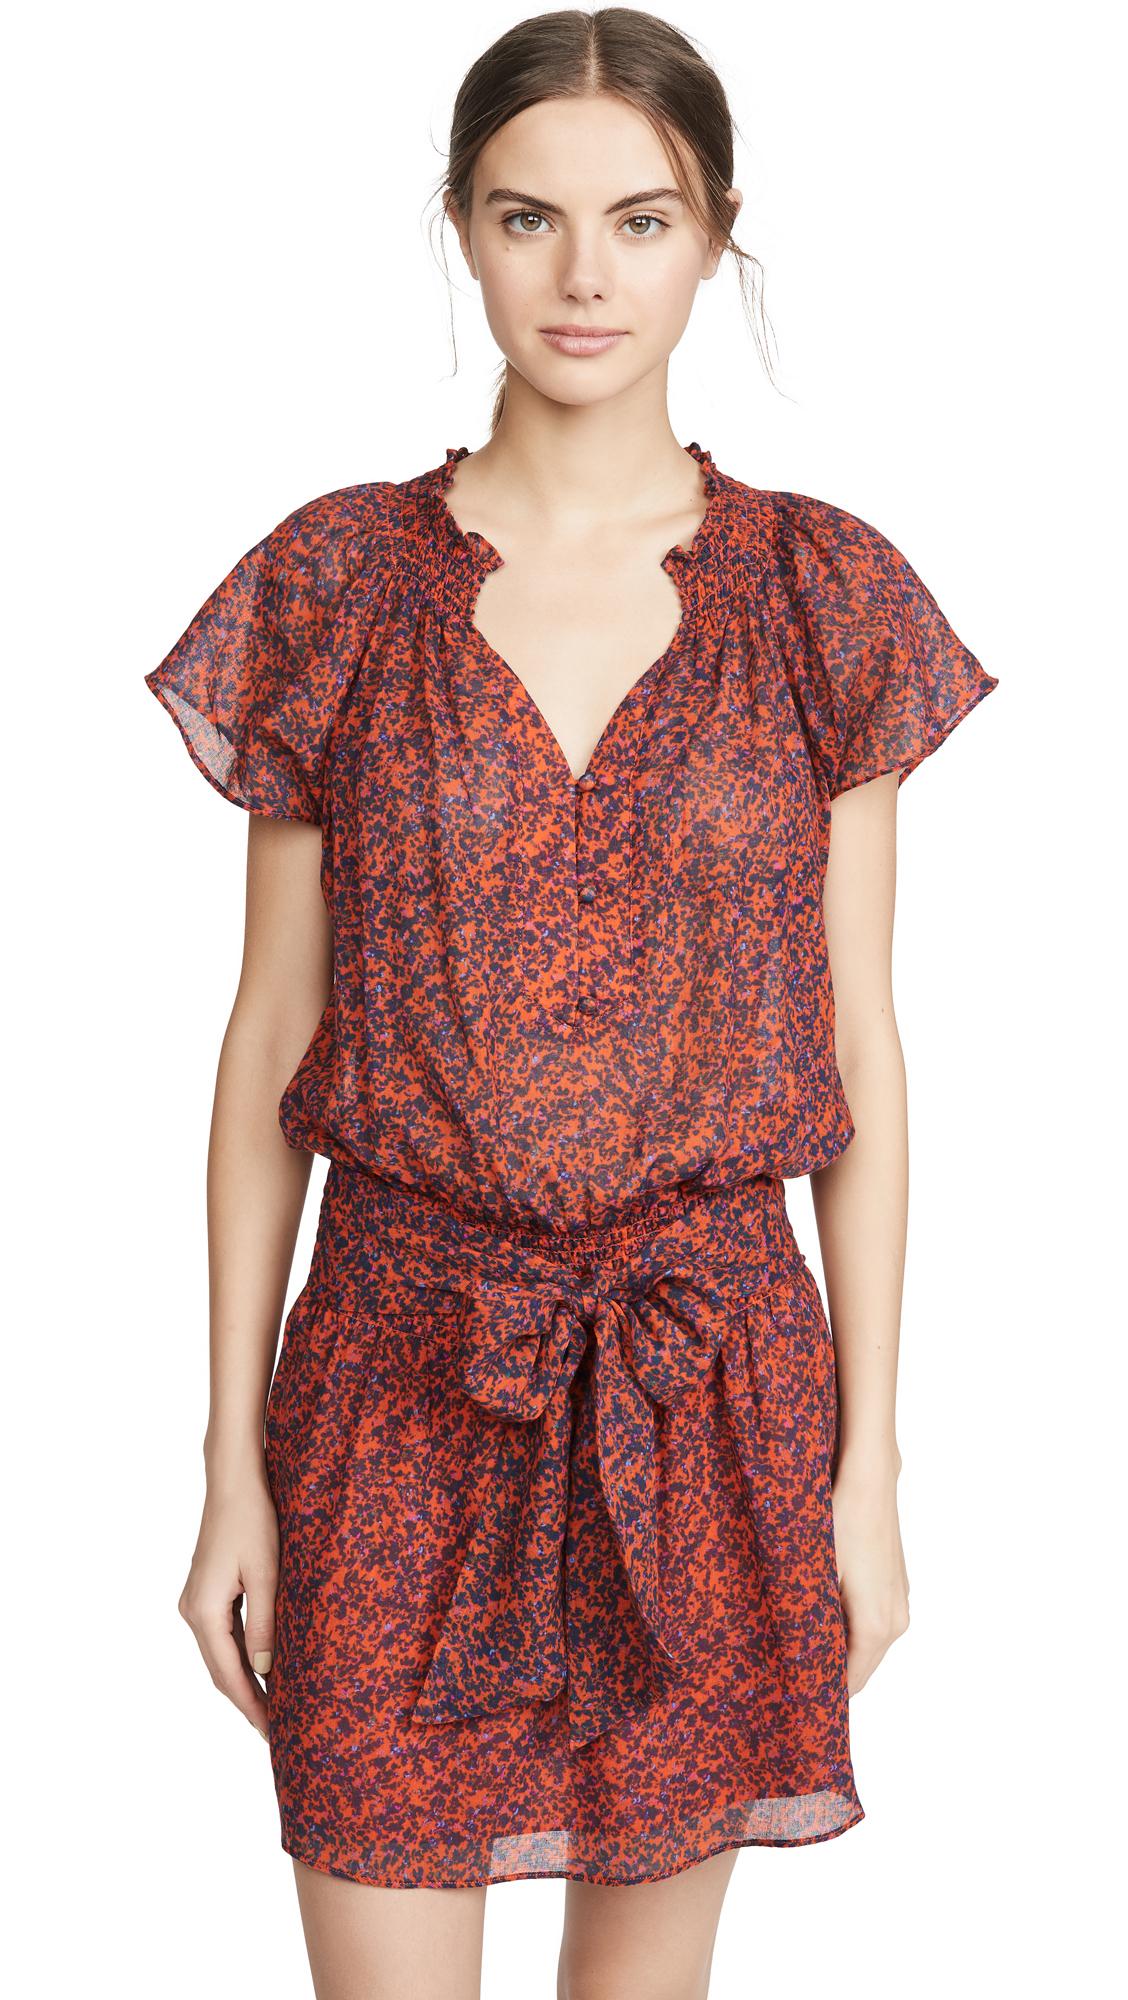 Parker Frisco Dress - 30% Off Sale